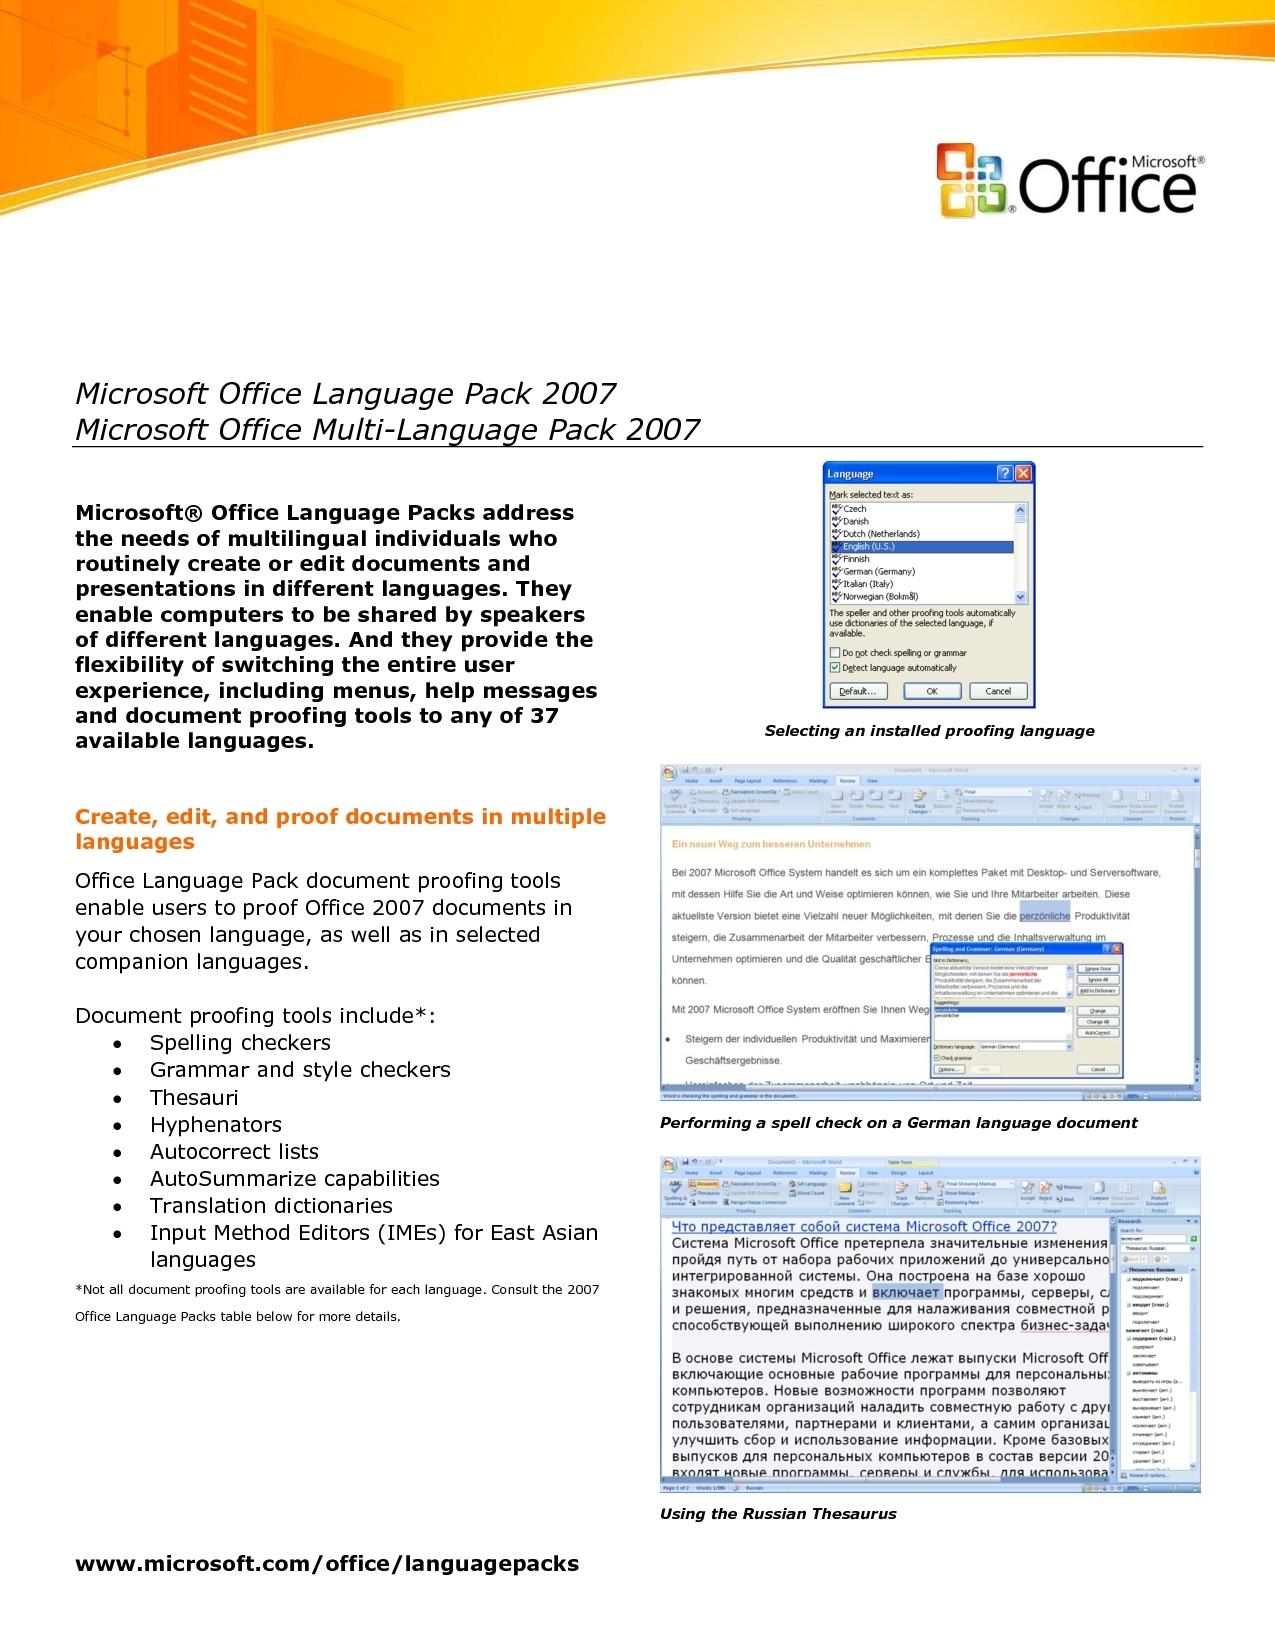 microsoft office invoice template microsoft office invoices invoice template free 2016 1275 X 1650